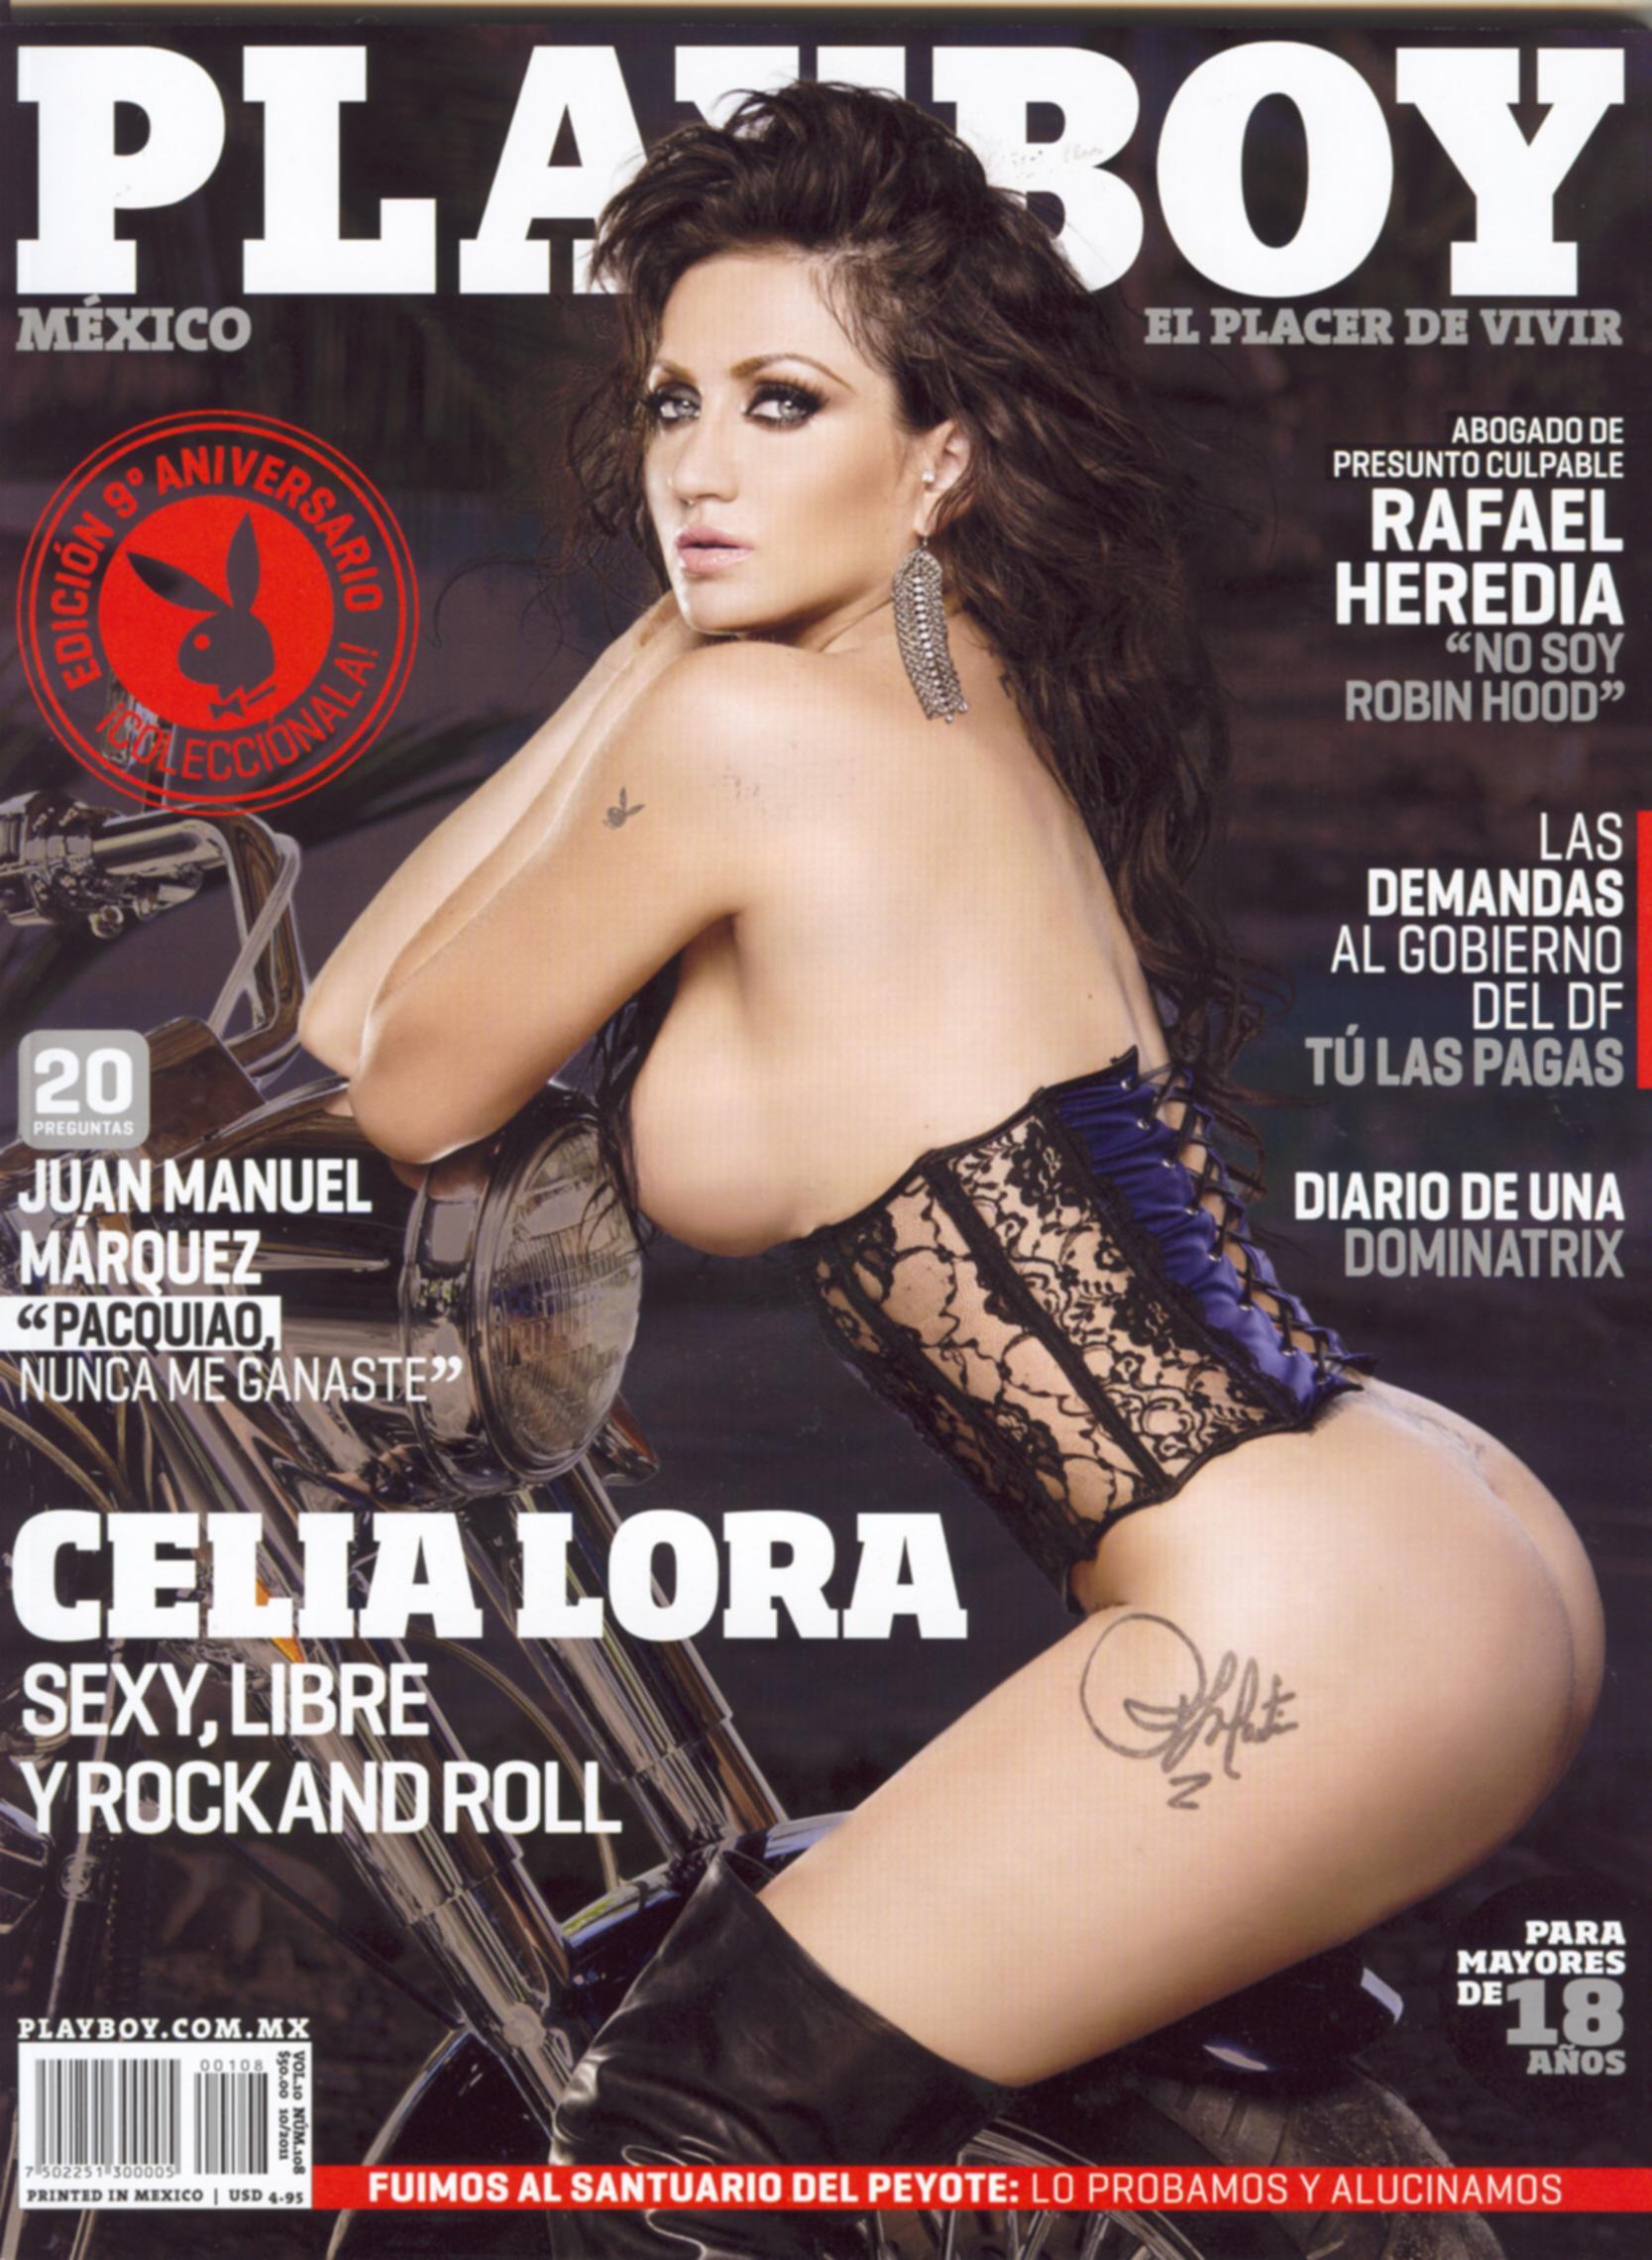 Celia Lora PB_mex_oct_2011